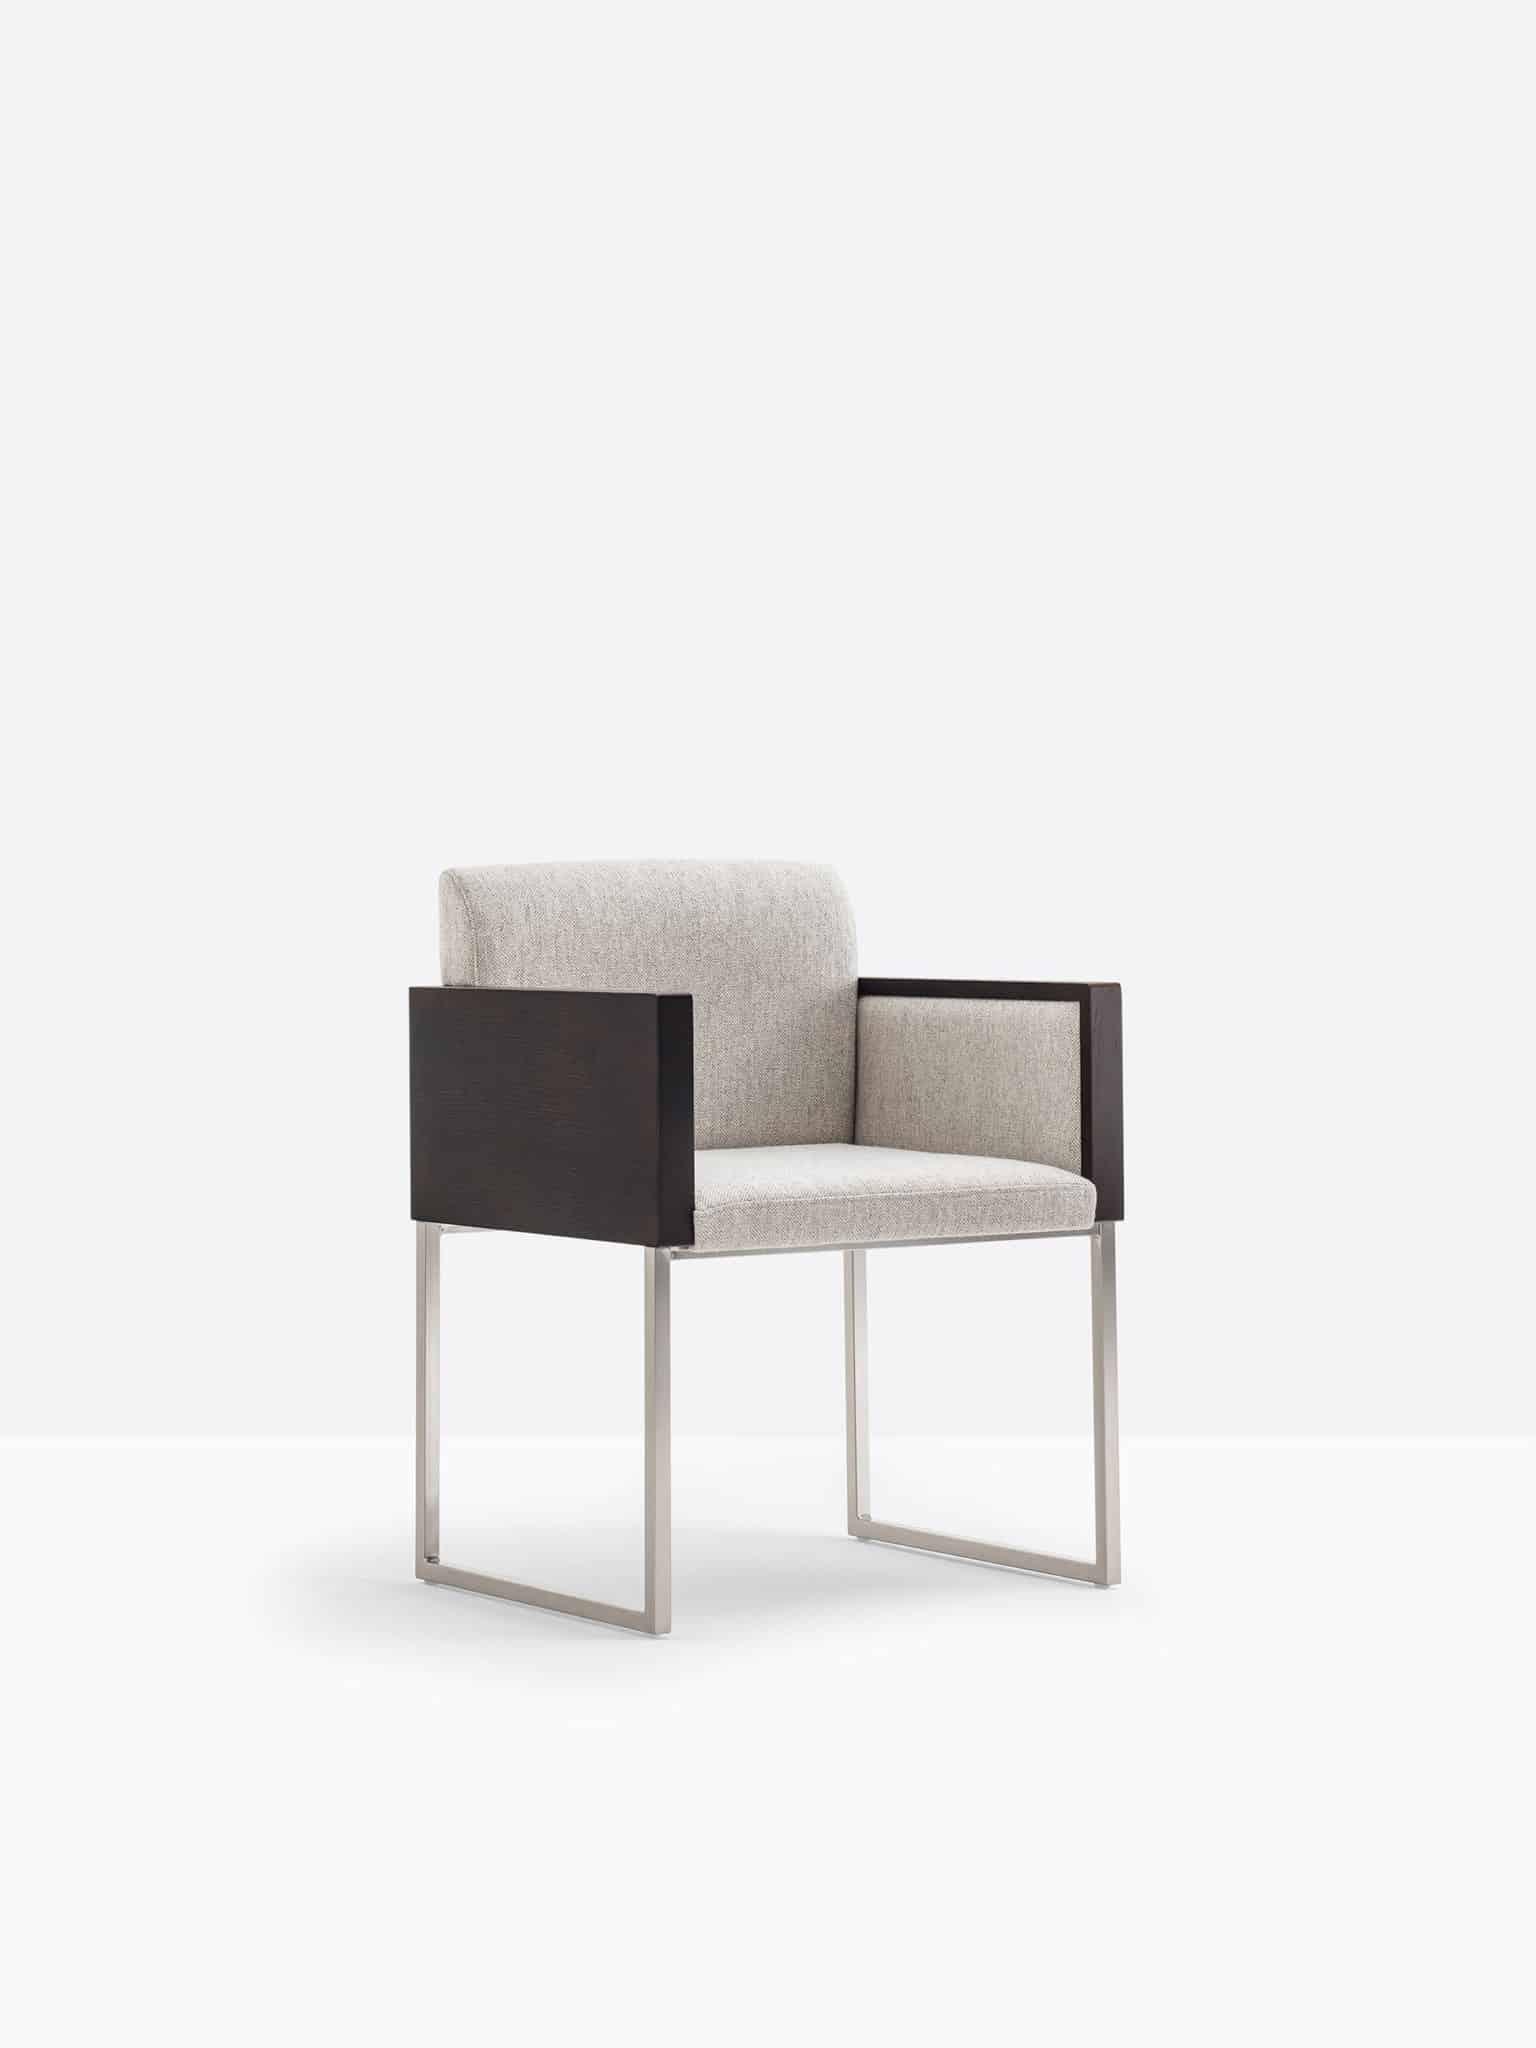 PEDRALI BOX 742 fauteuil Bois recouvert de tissu